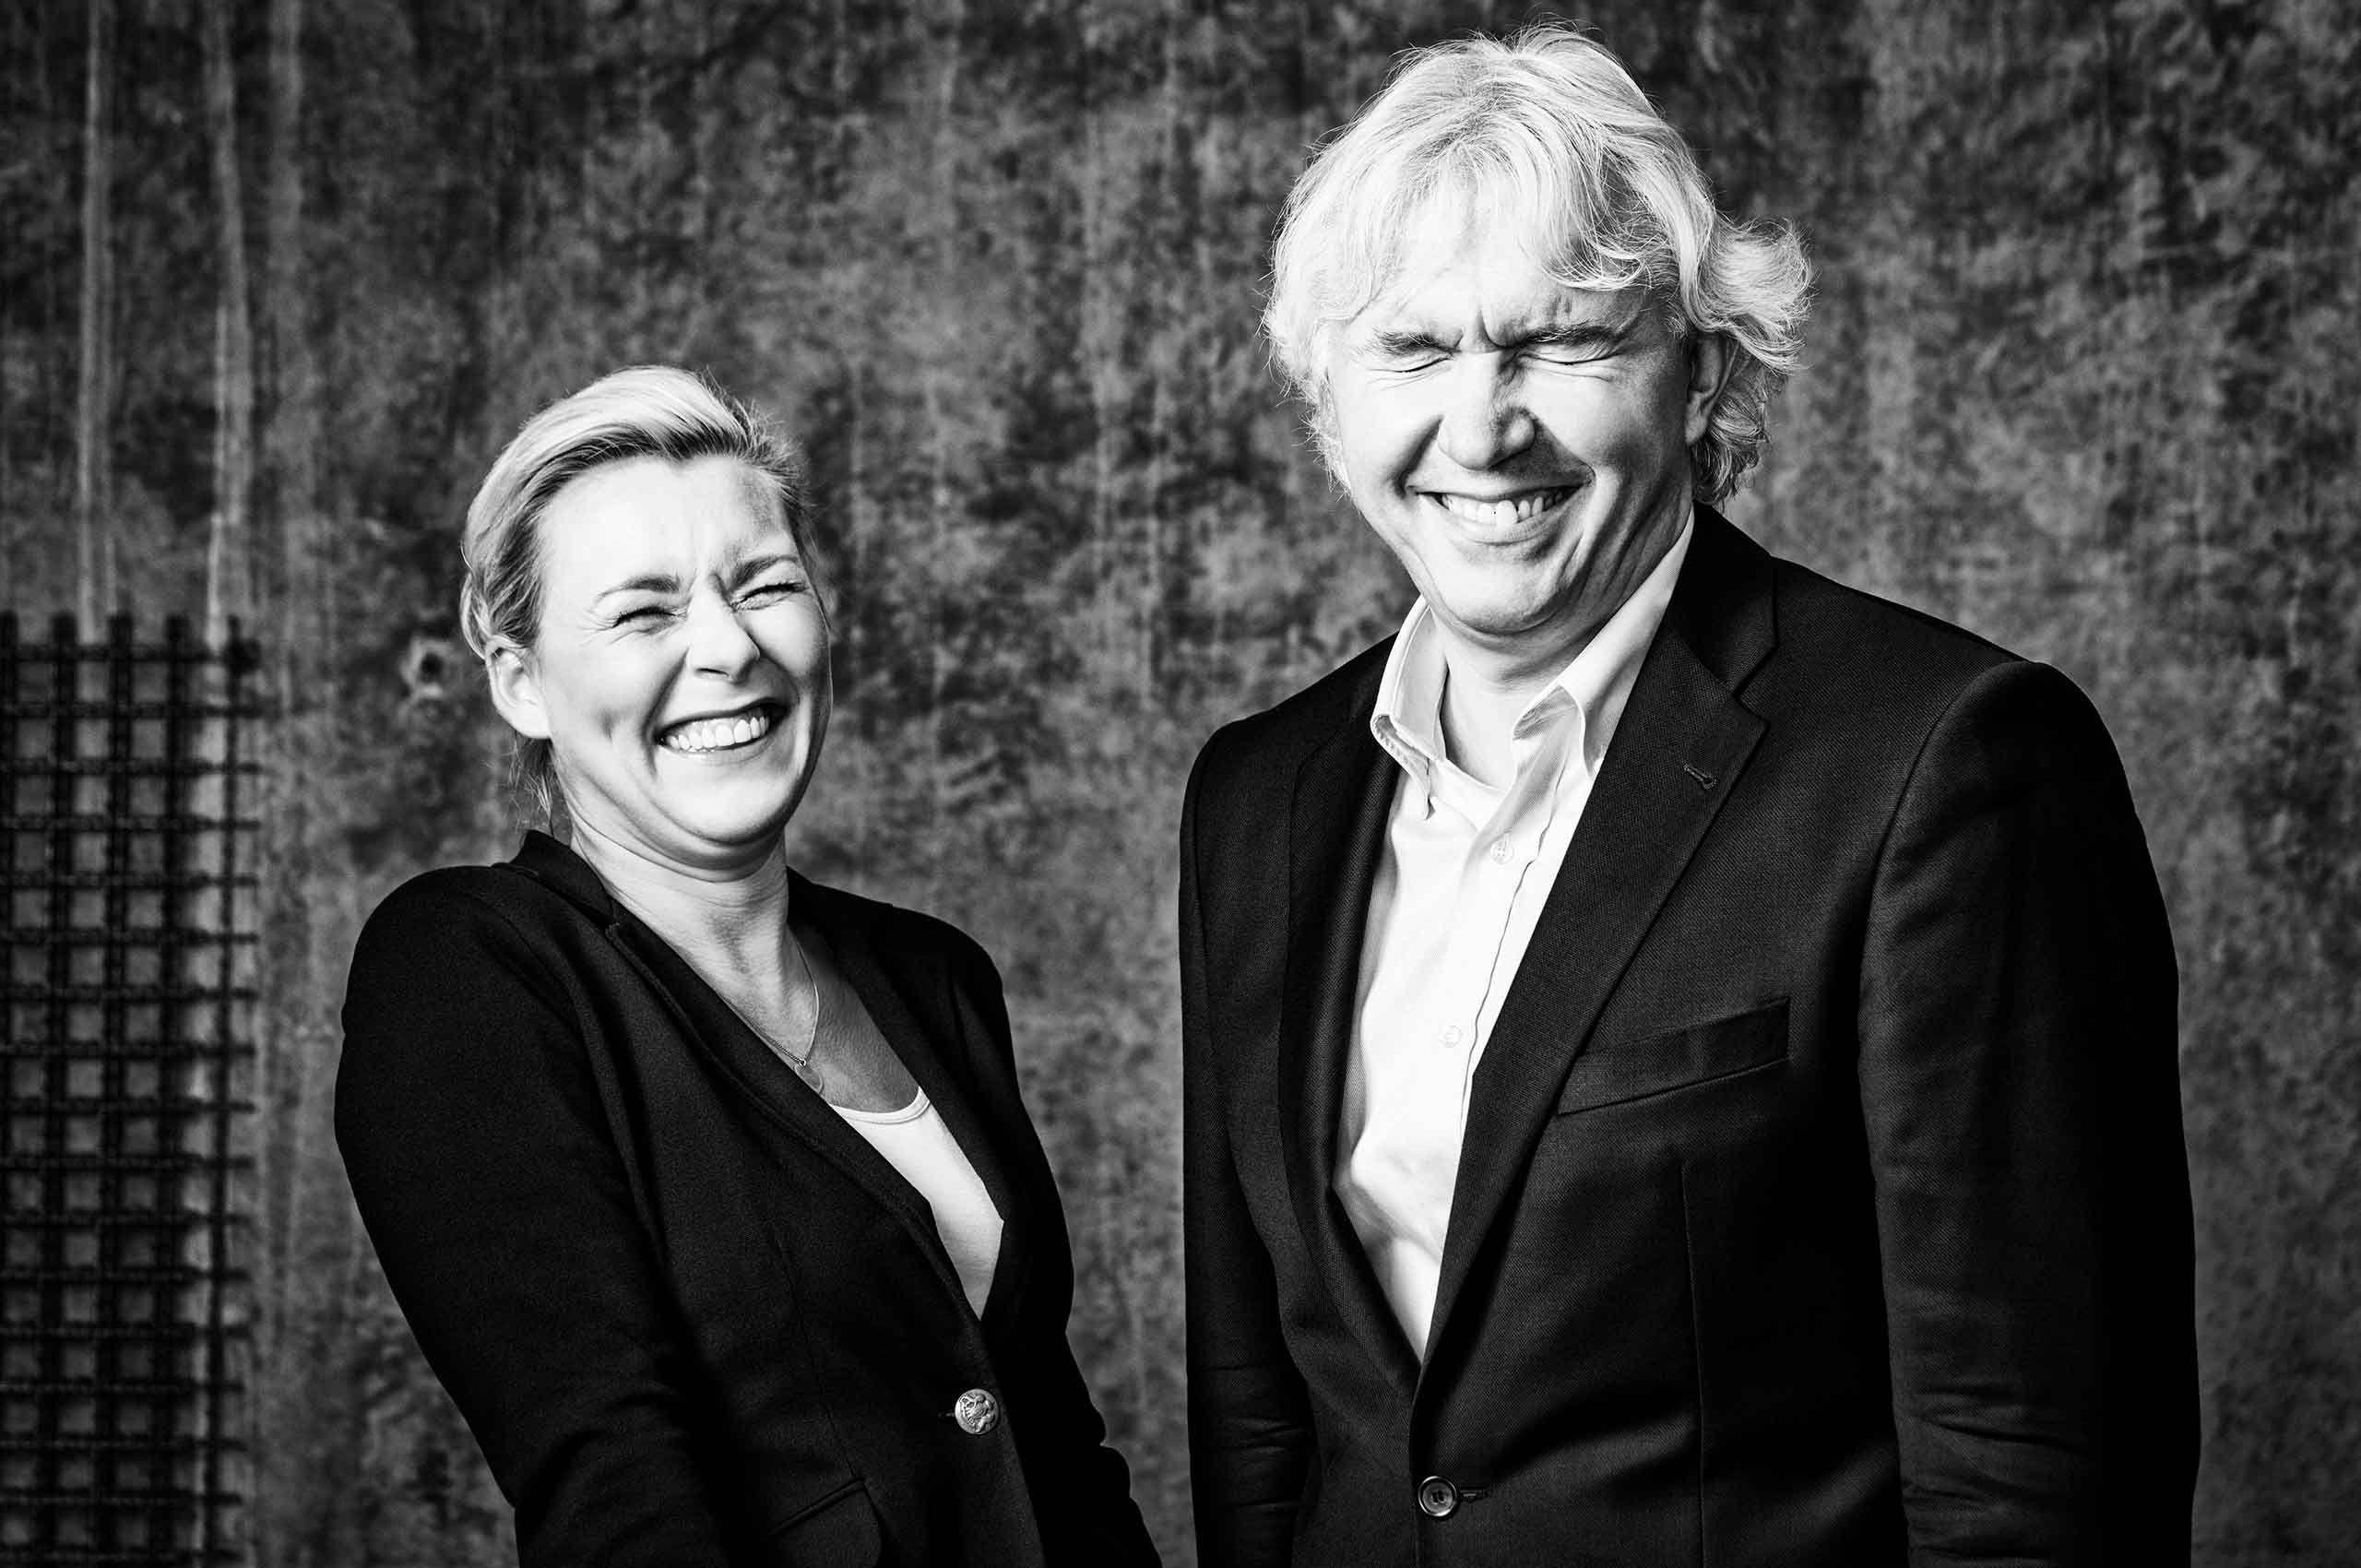 laughingcousins-bw-by-HenrikOlundPhotography.jpg